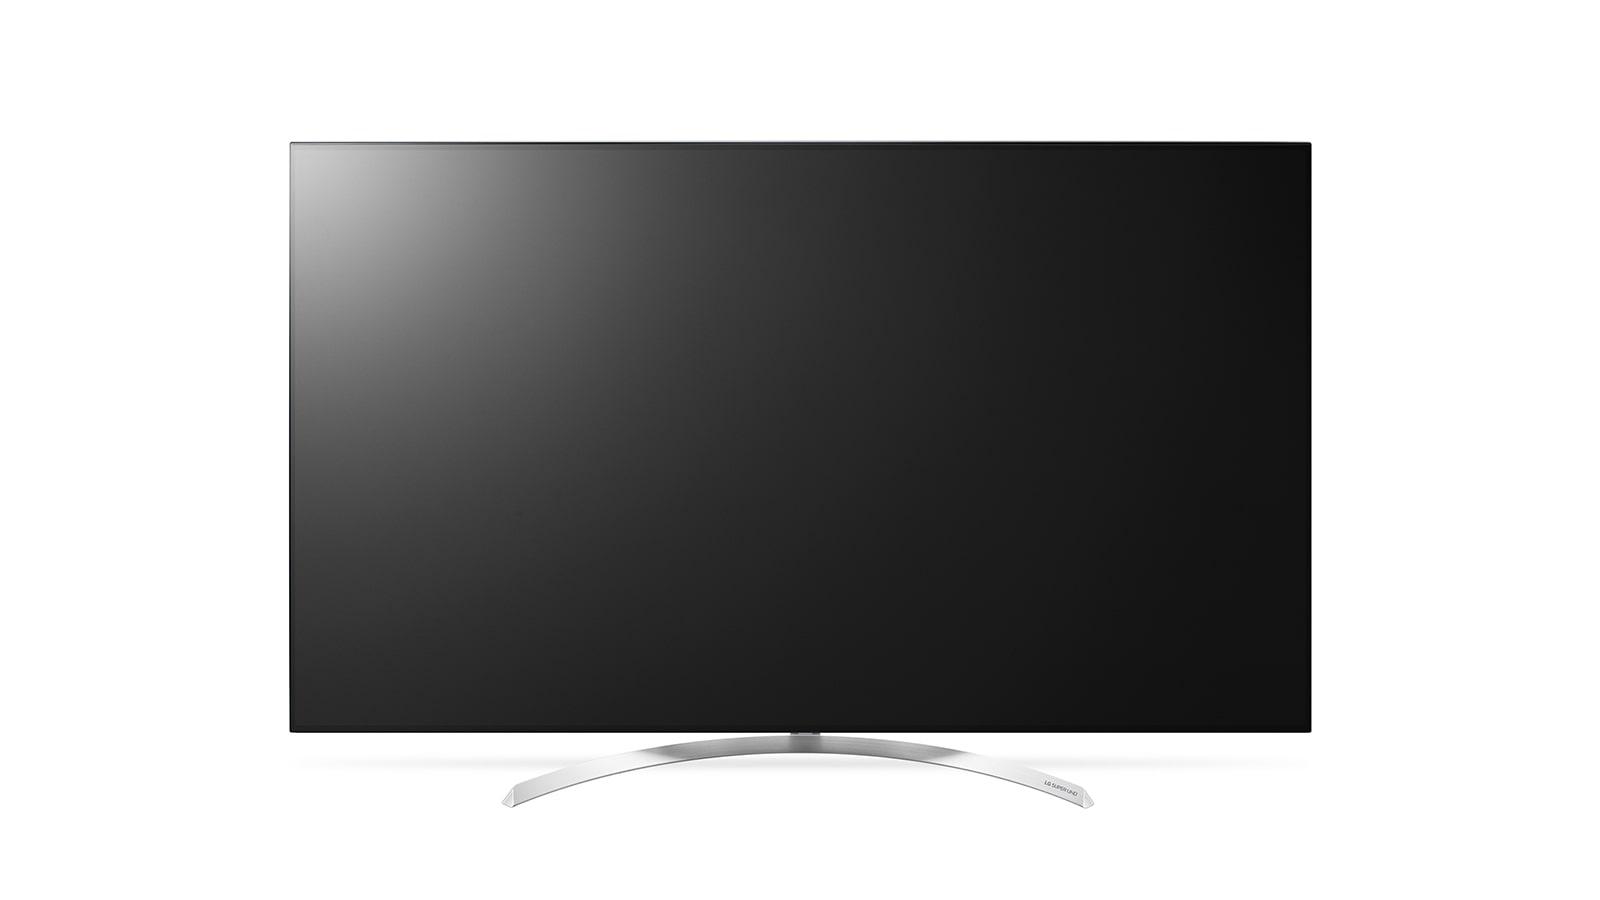 LG 55SJ8500 |55 Inch SJ8500 |SUPER UHD 4K TV | LG HK